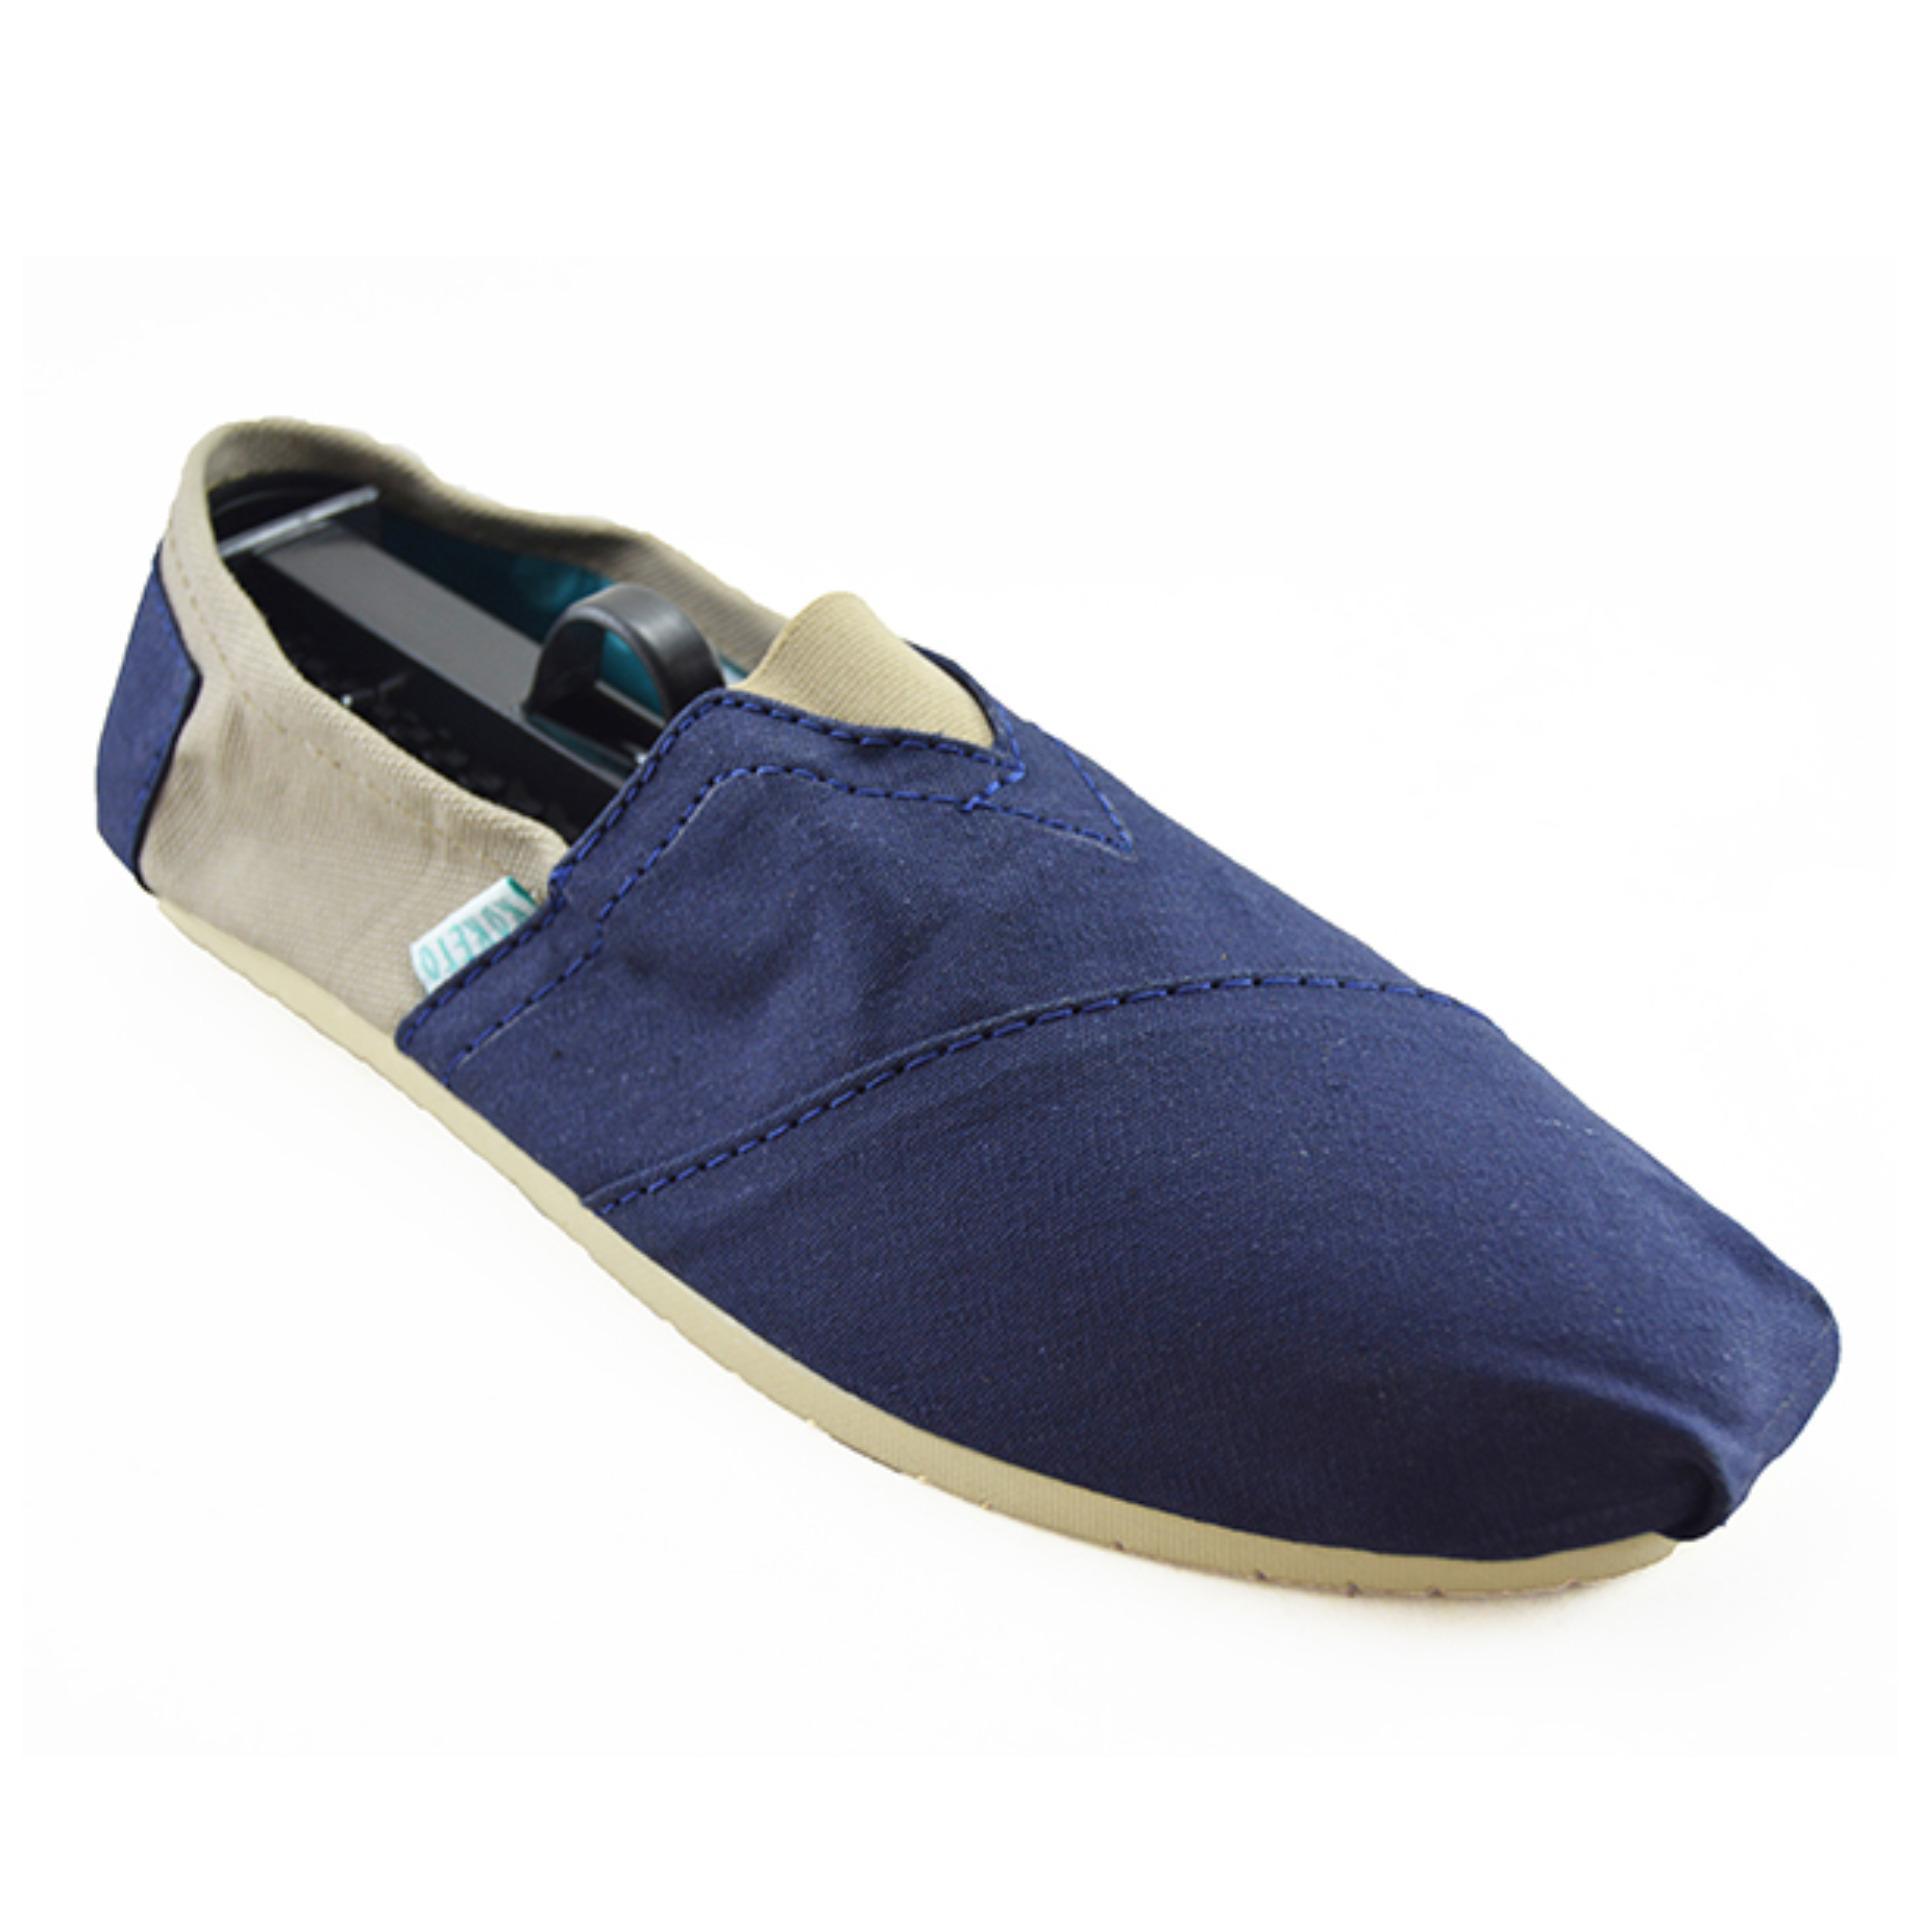 Koketo Zis 04 Sepatu Sneakers Wanita ...